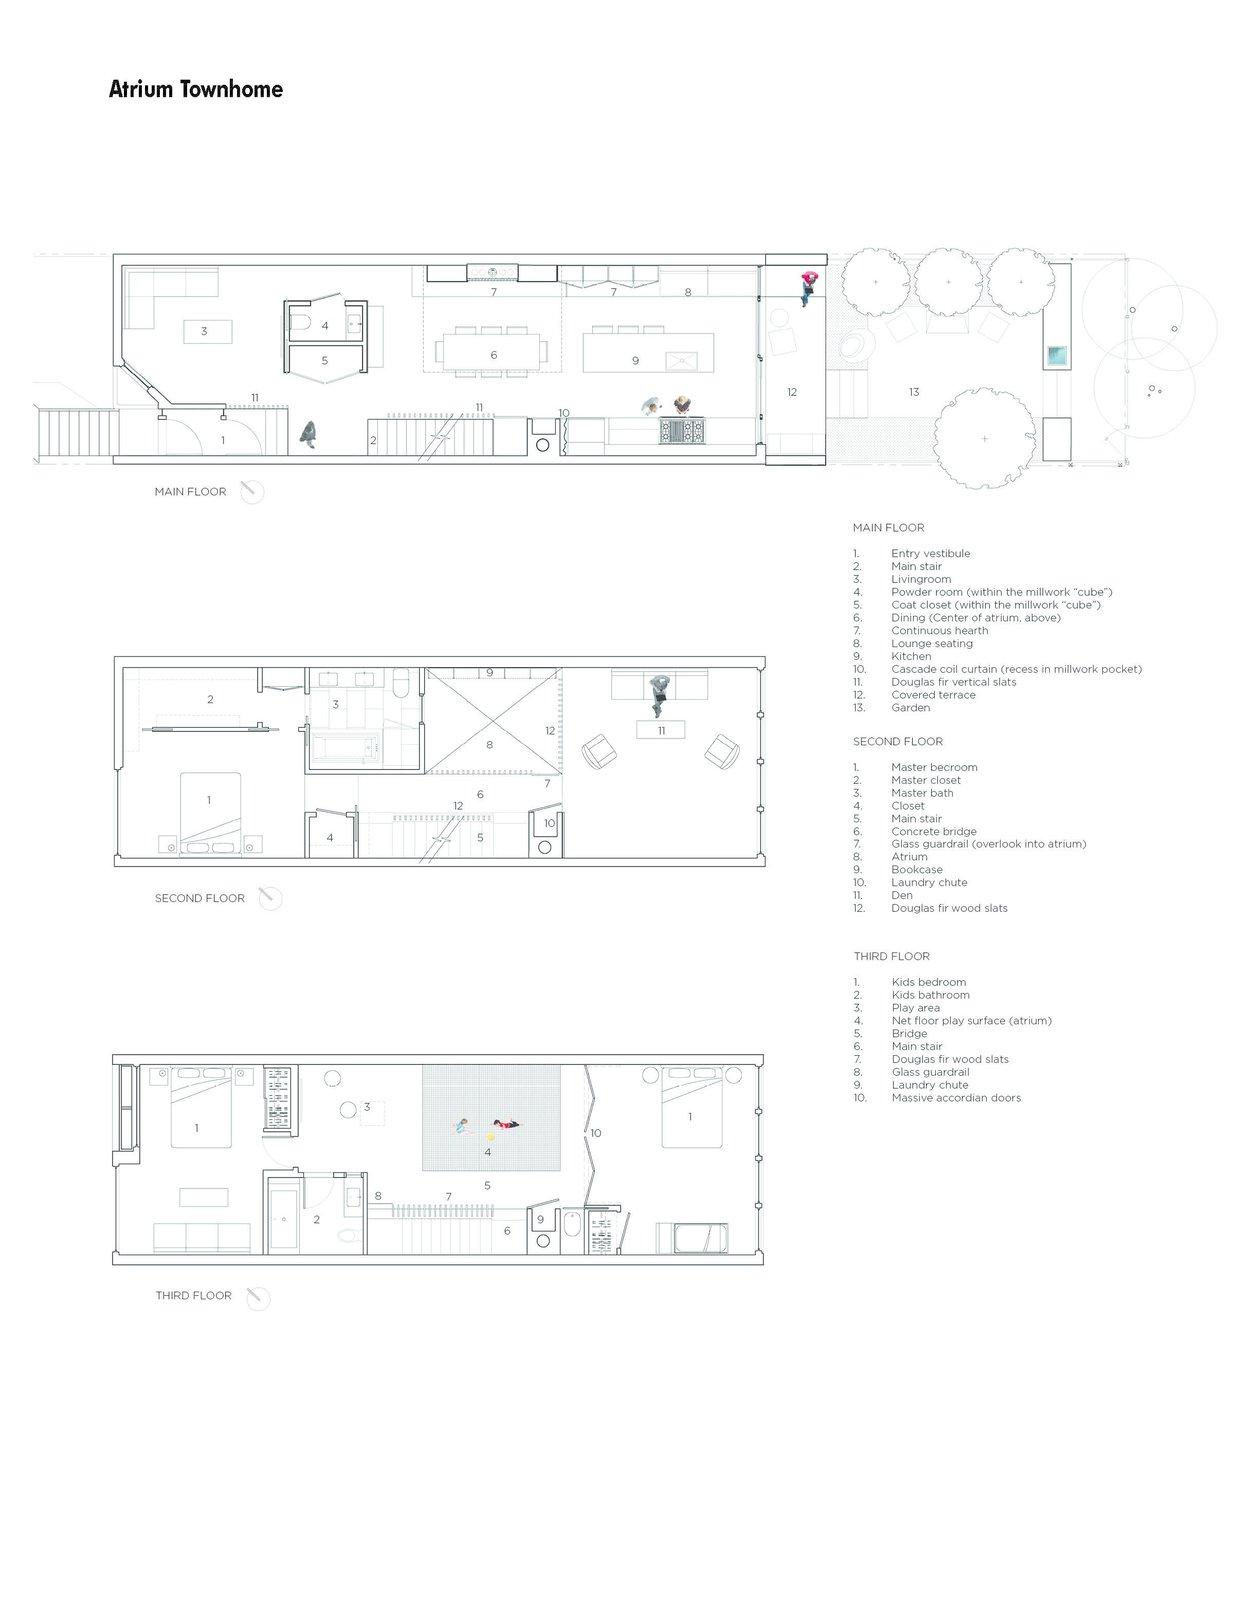 Floor plans  Atrium Townhome by RobitailleCurtis